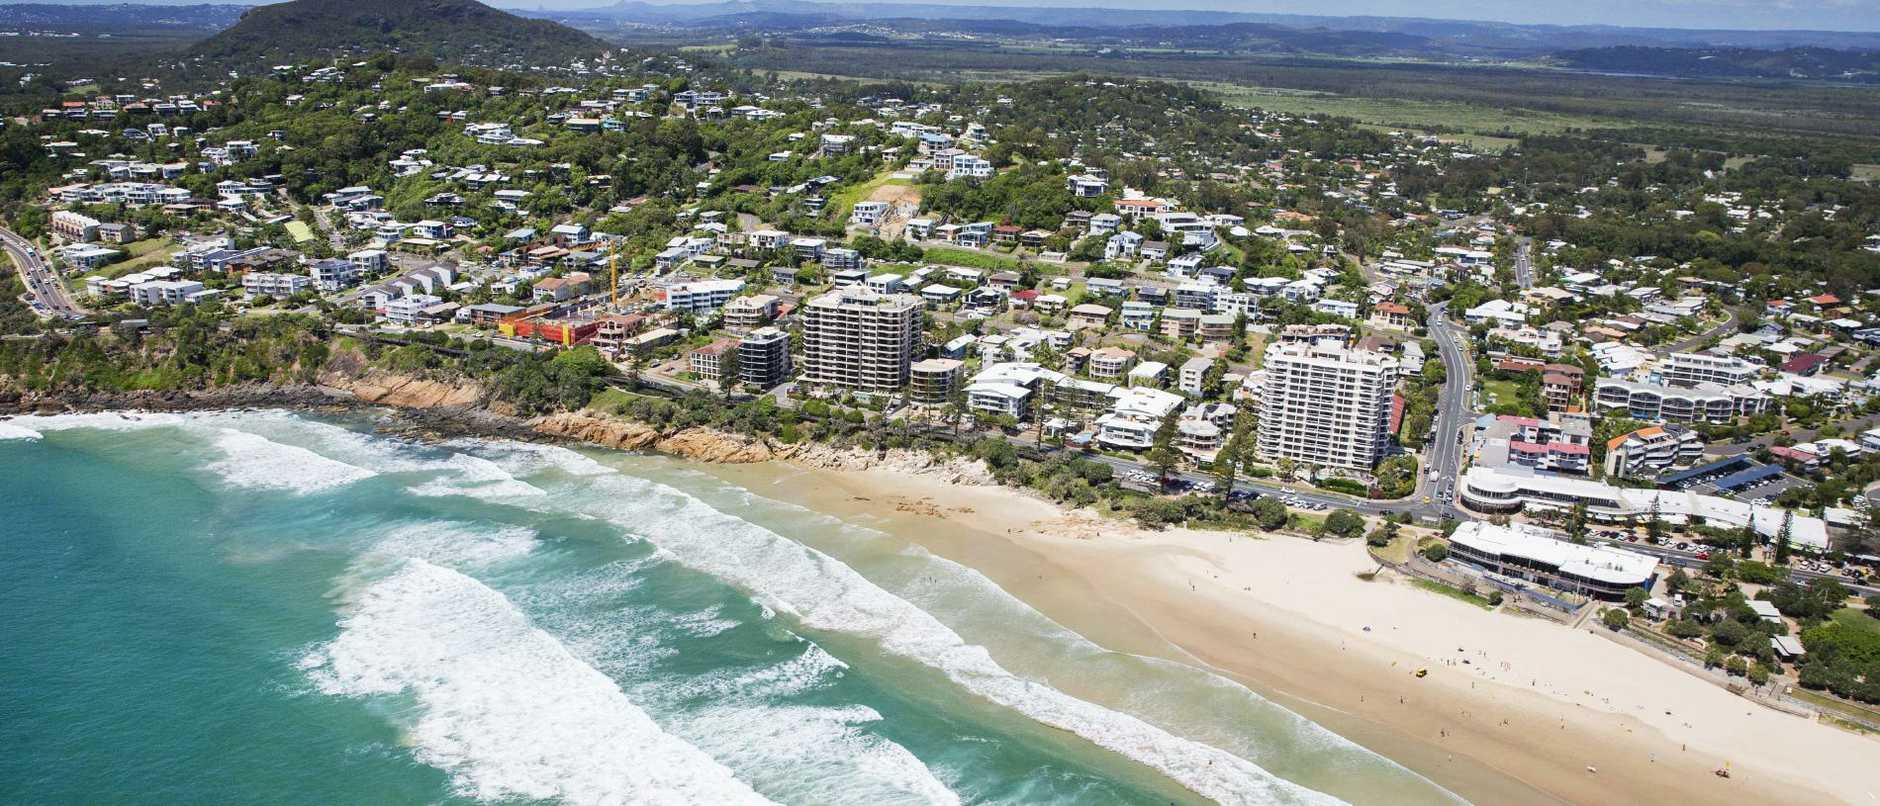 Aerial view over Coolum Beach. Photo Lachie Millard